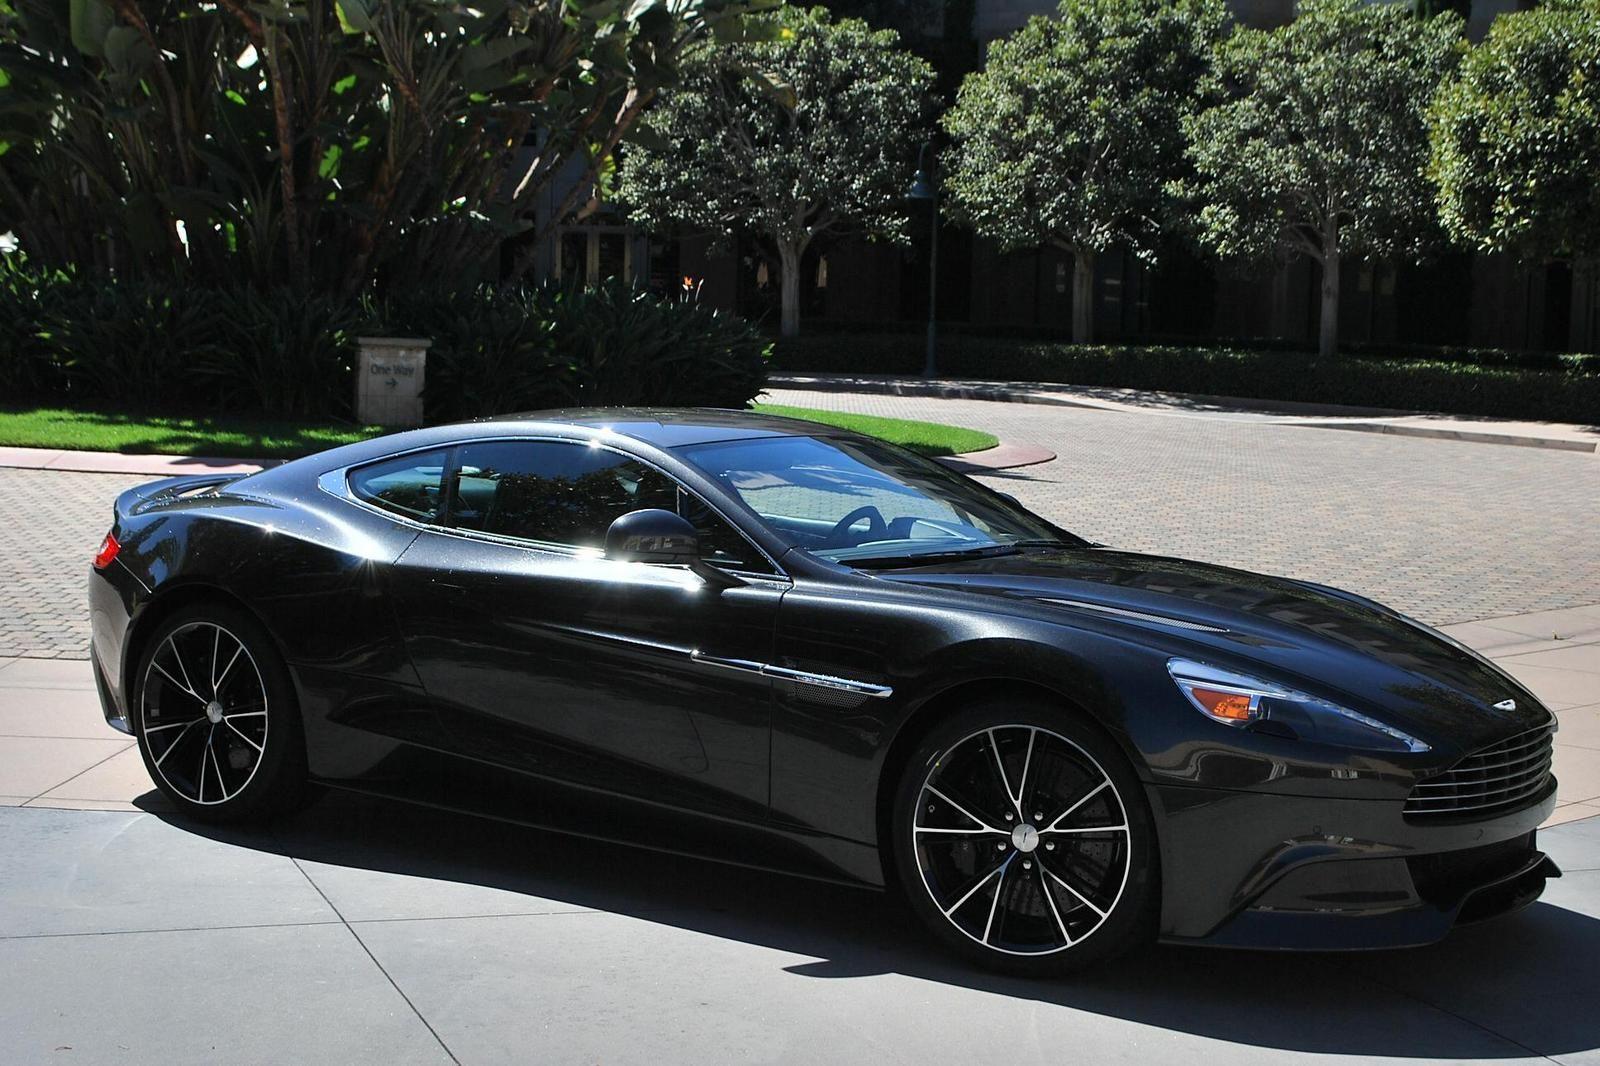 Pin By Aston Martin On Aston Martin Vanquish Pinterest Aston - Aston martin vanquish black